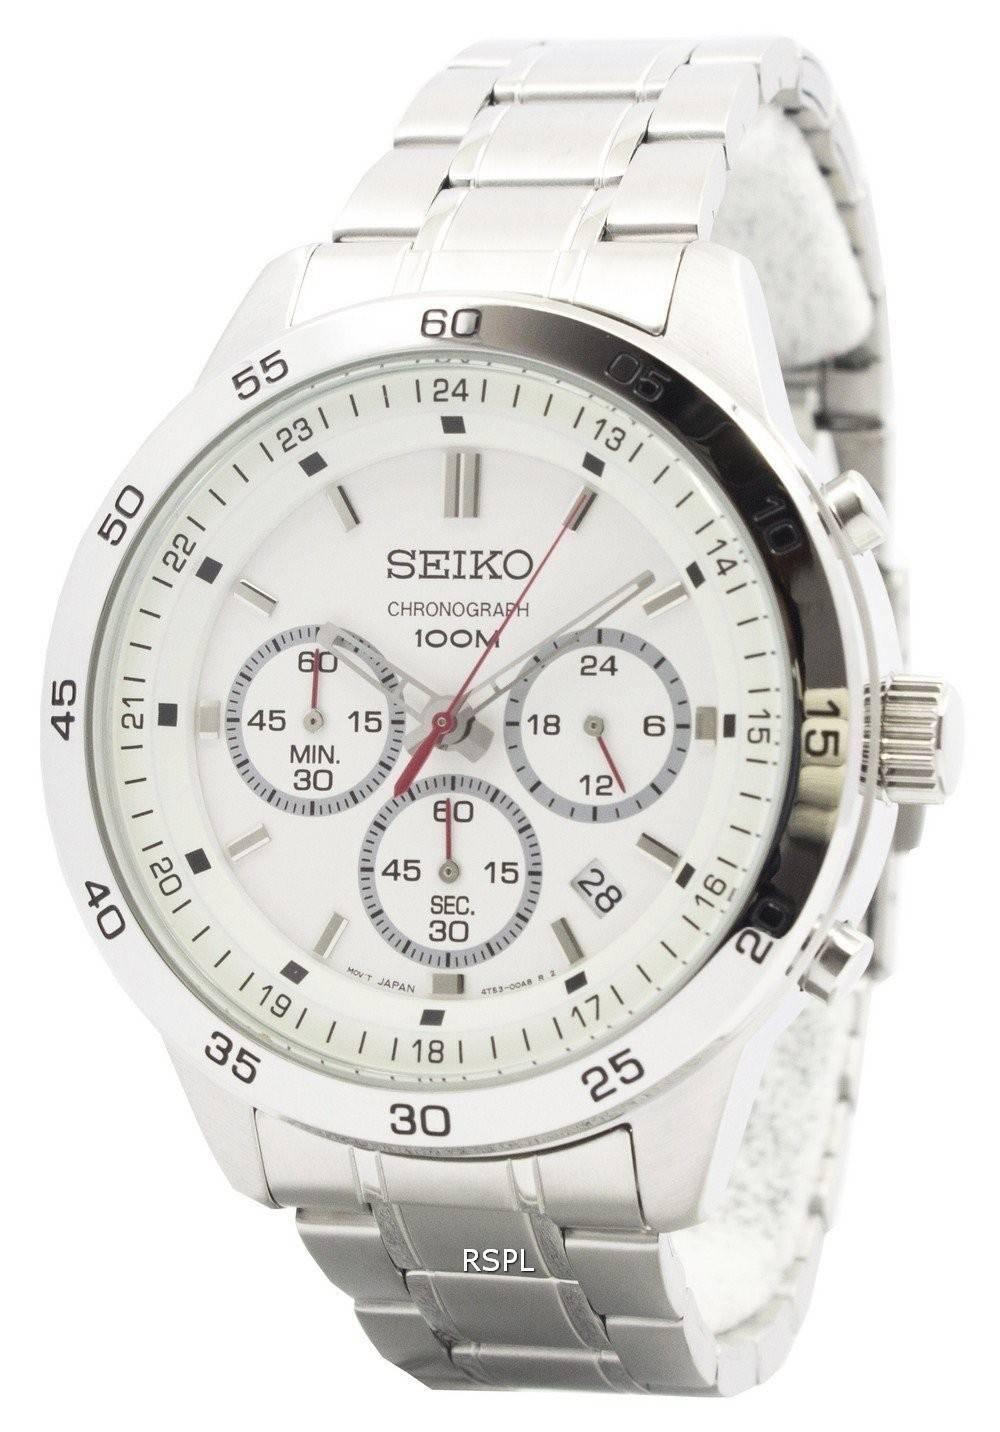 Seiko Chronograph Jam Tangan Strap Stainless Steel Silver Sks515p1 Sks521p1 Pria Pl15002js Source Neo Sports Sks515p Mens Watch